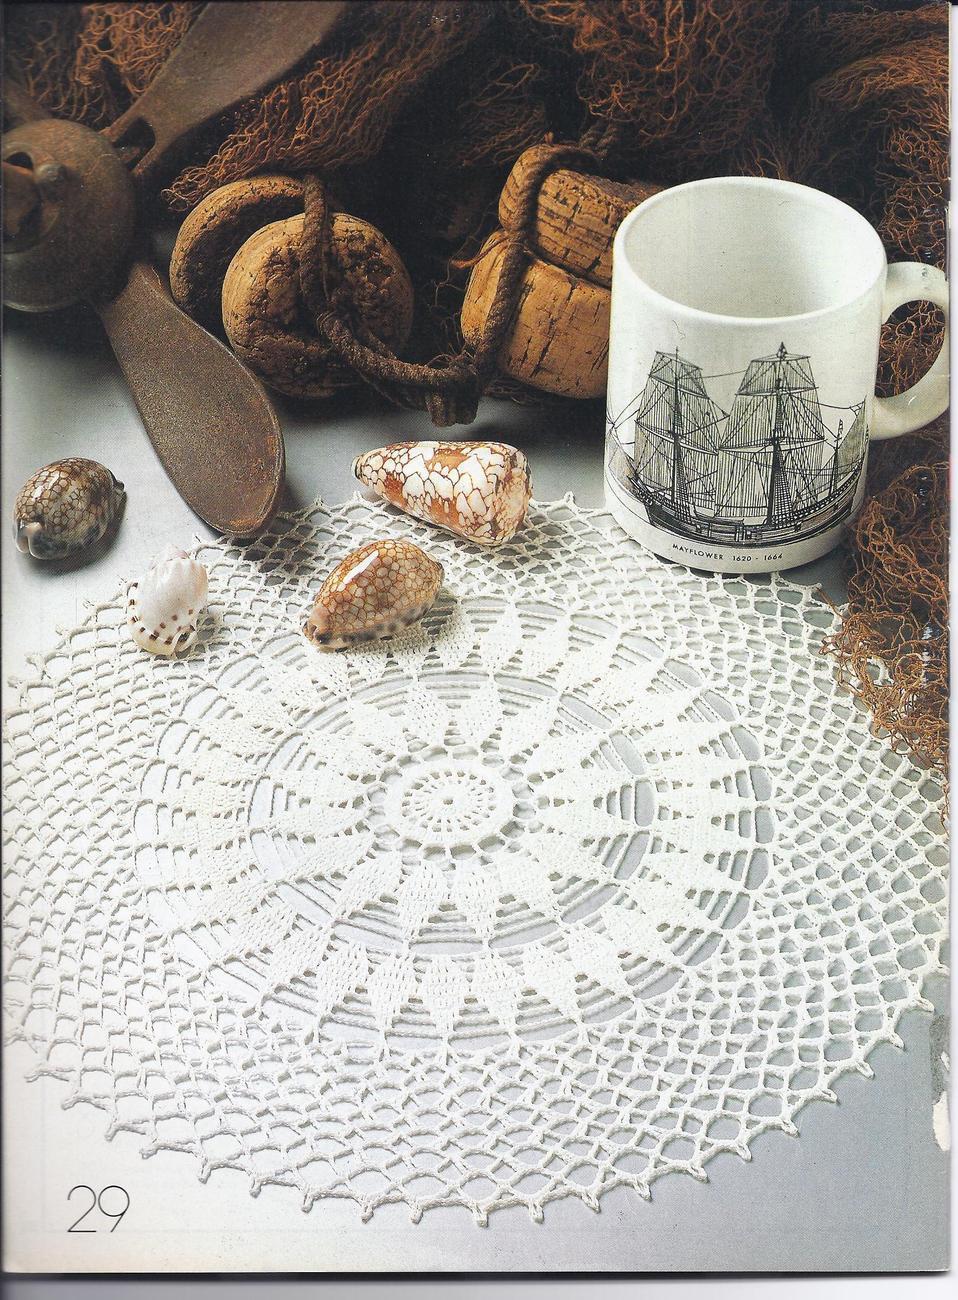 Decorative Crochet Pattern Magazine #18~~29 Patterns